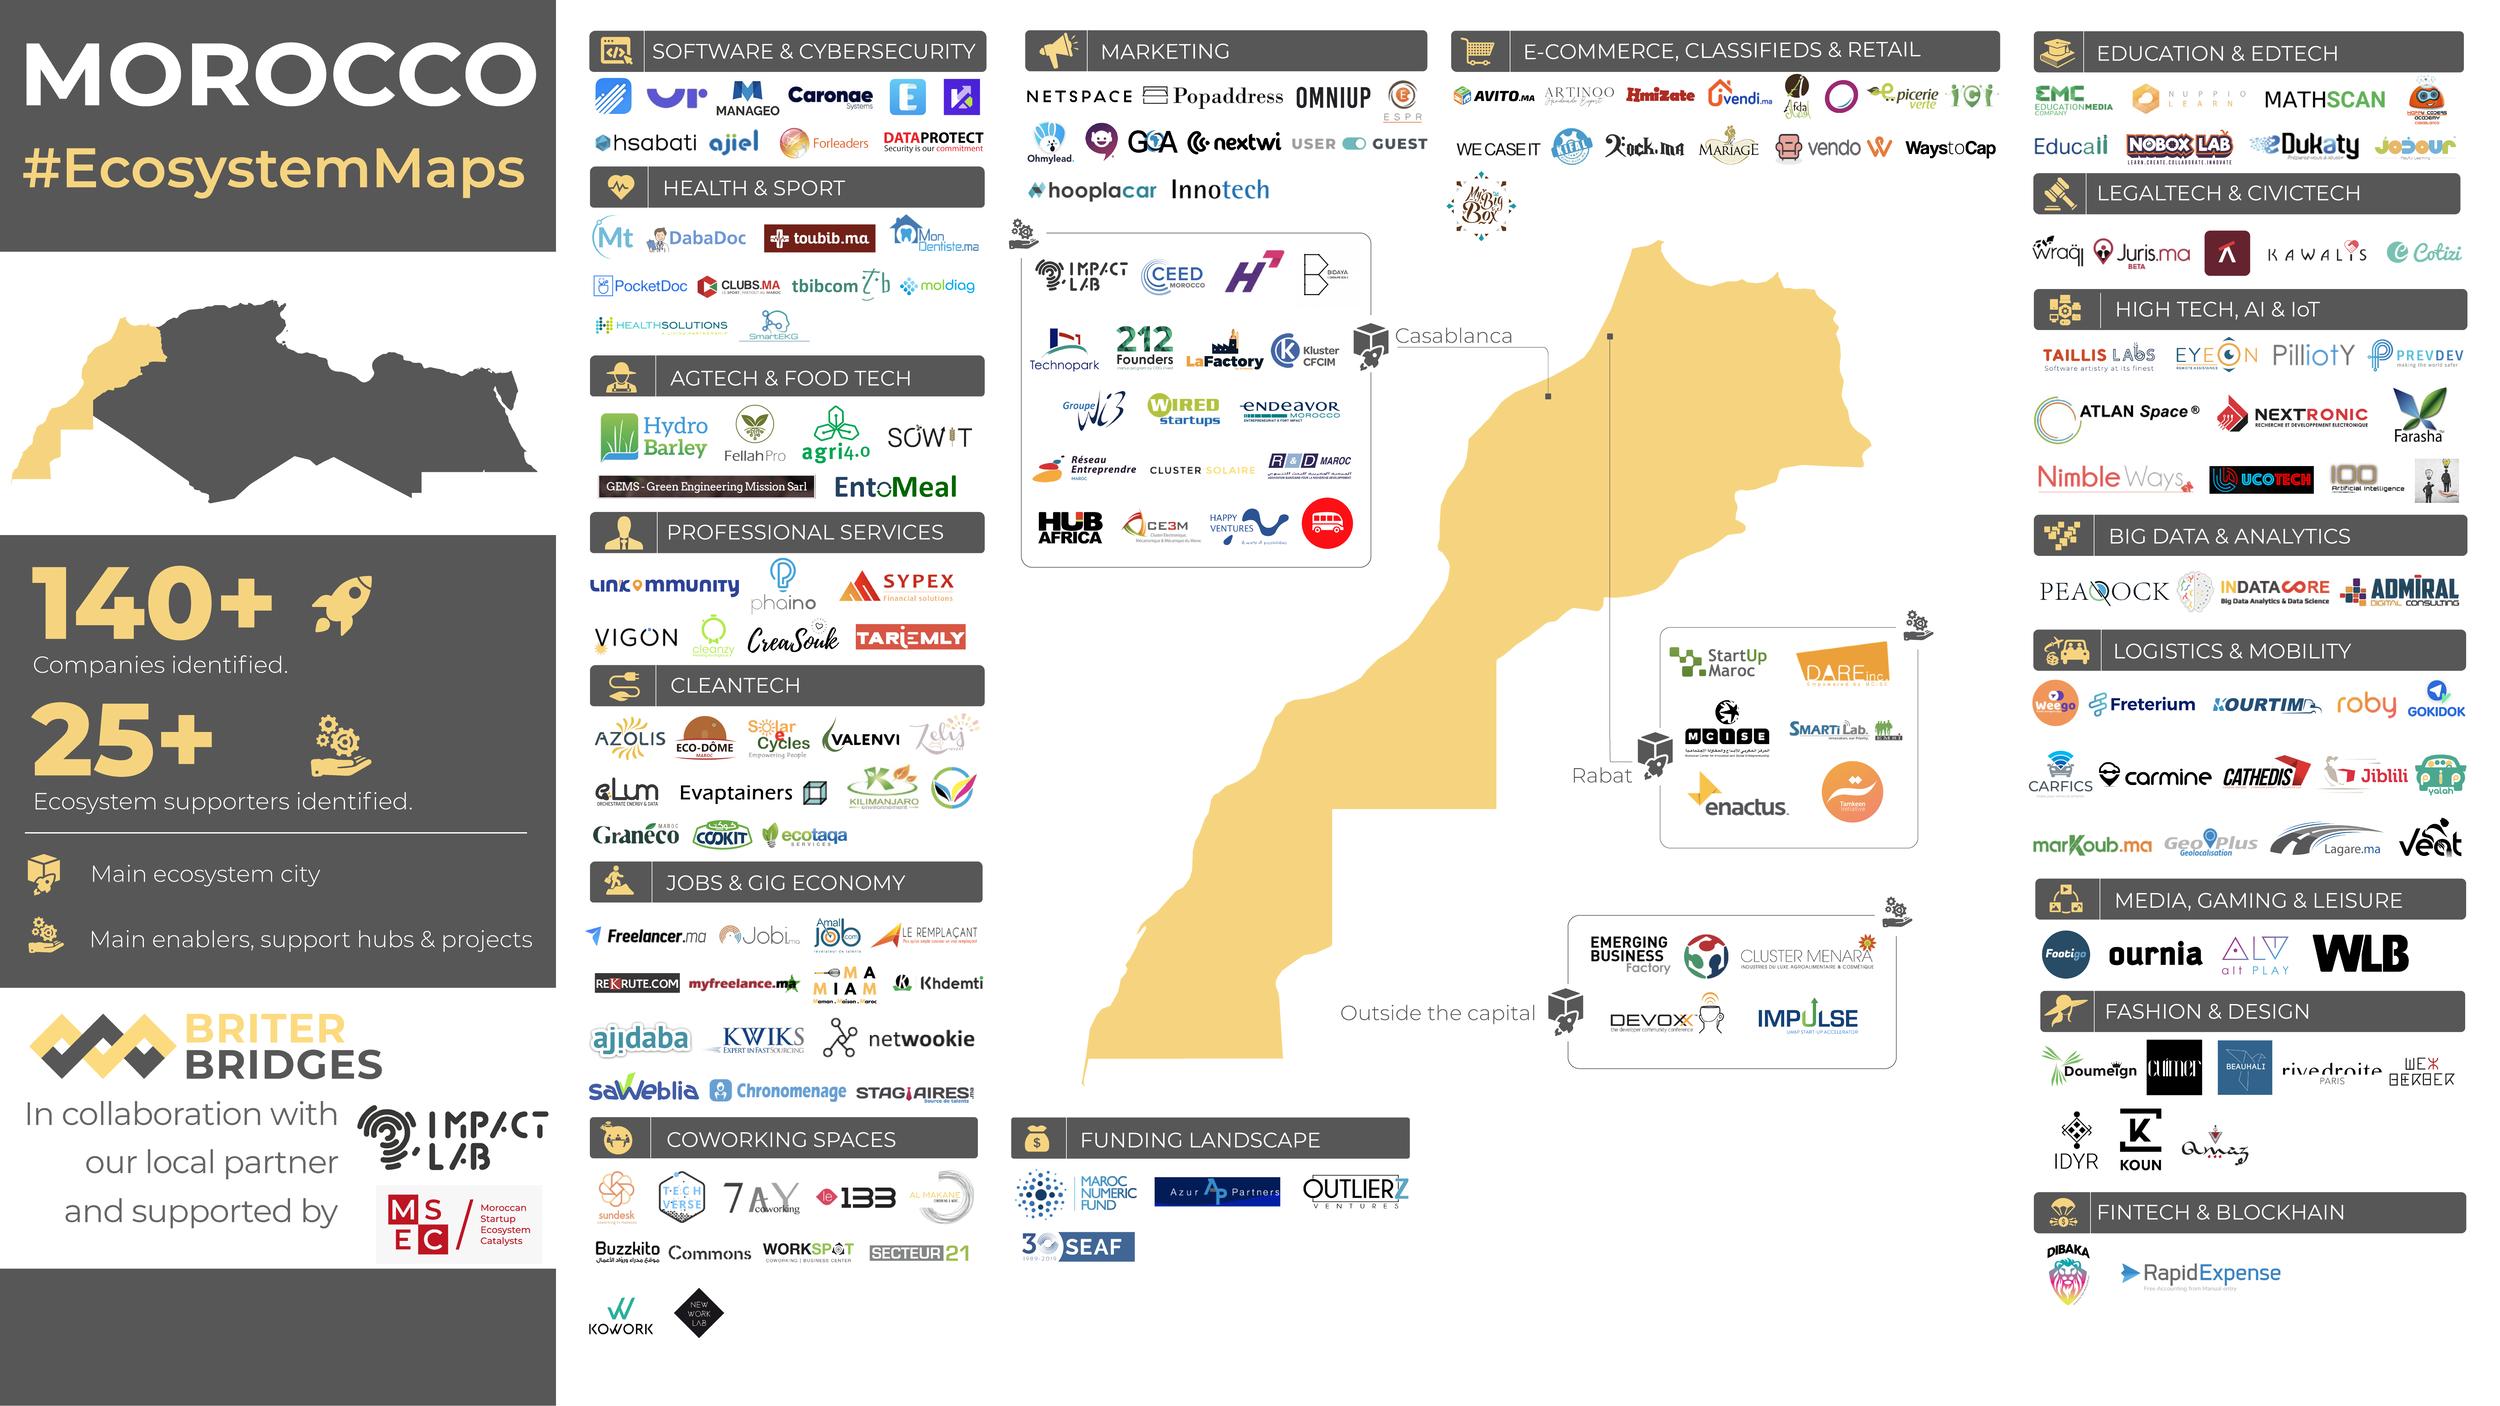 Morocco's Tech Ecosystem Map - Q4 2019